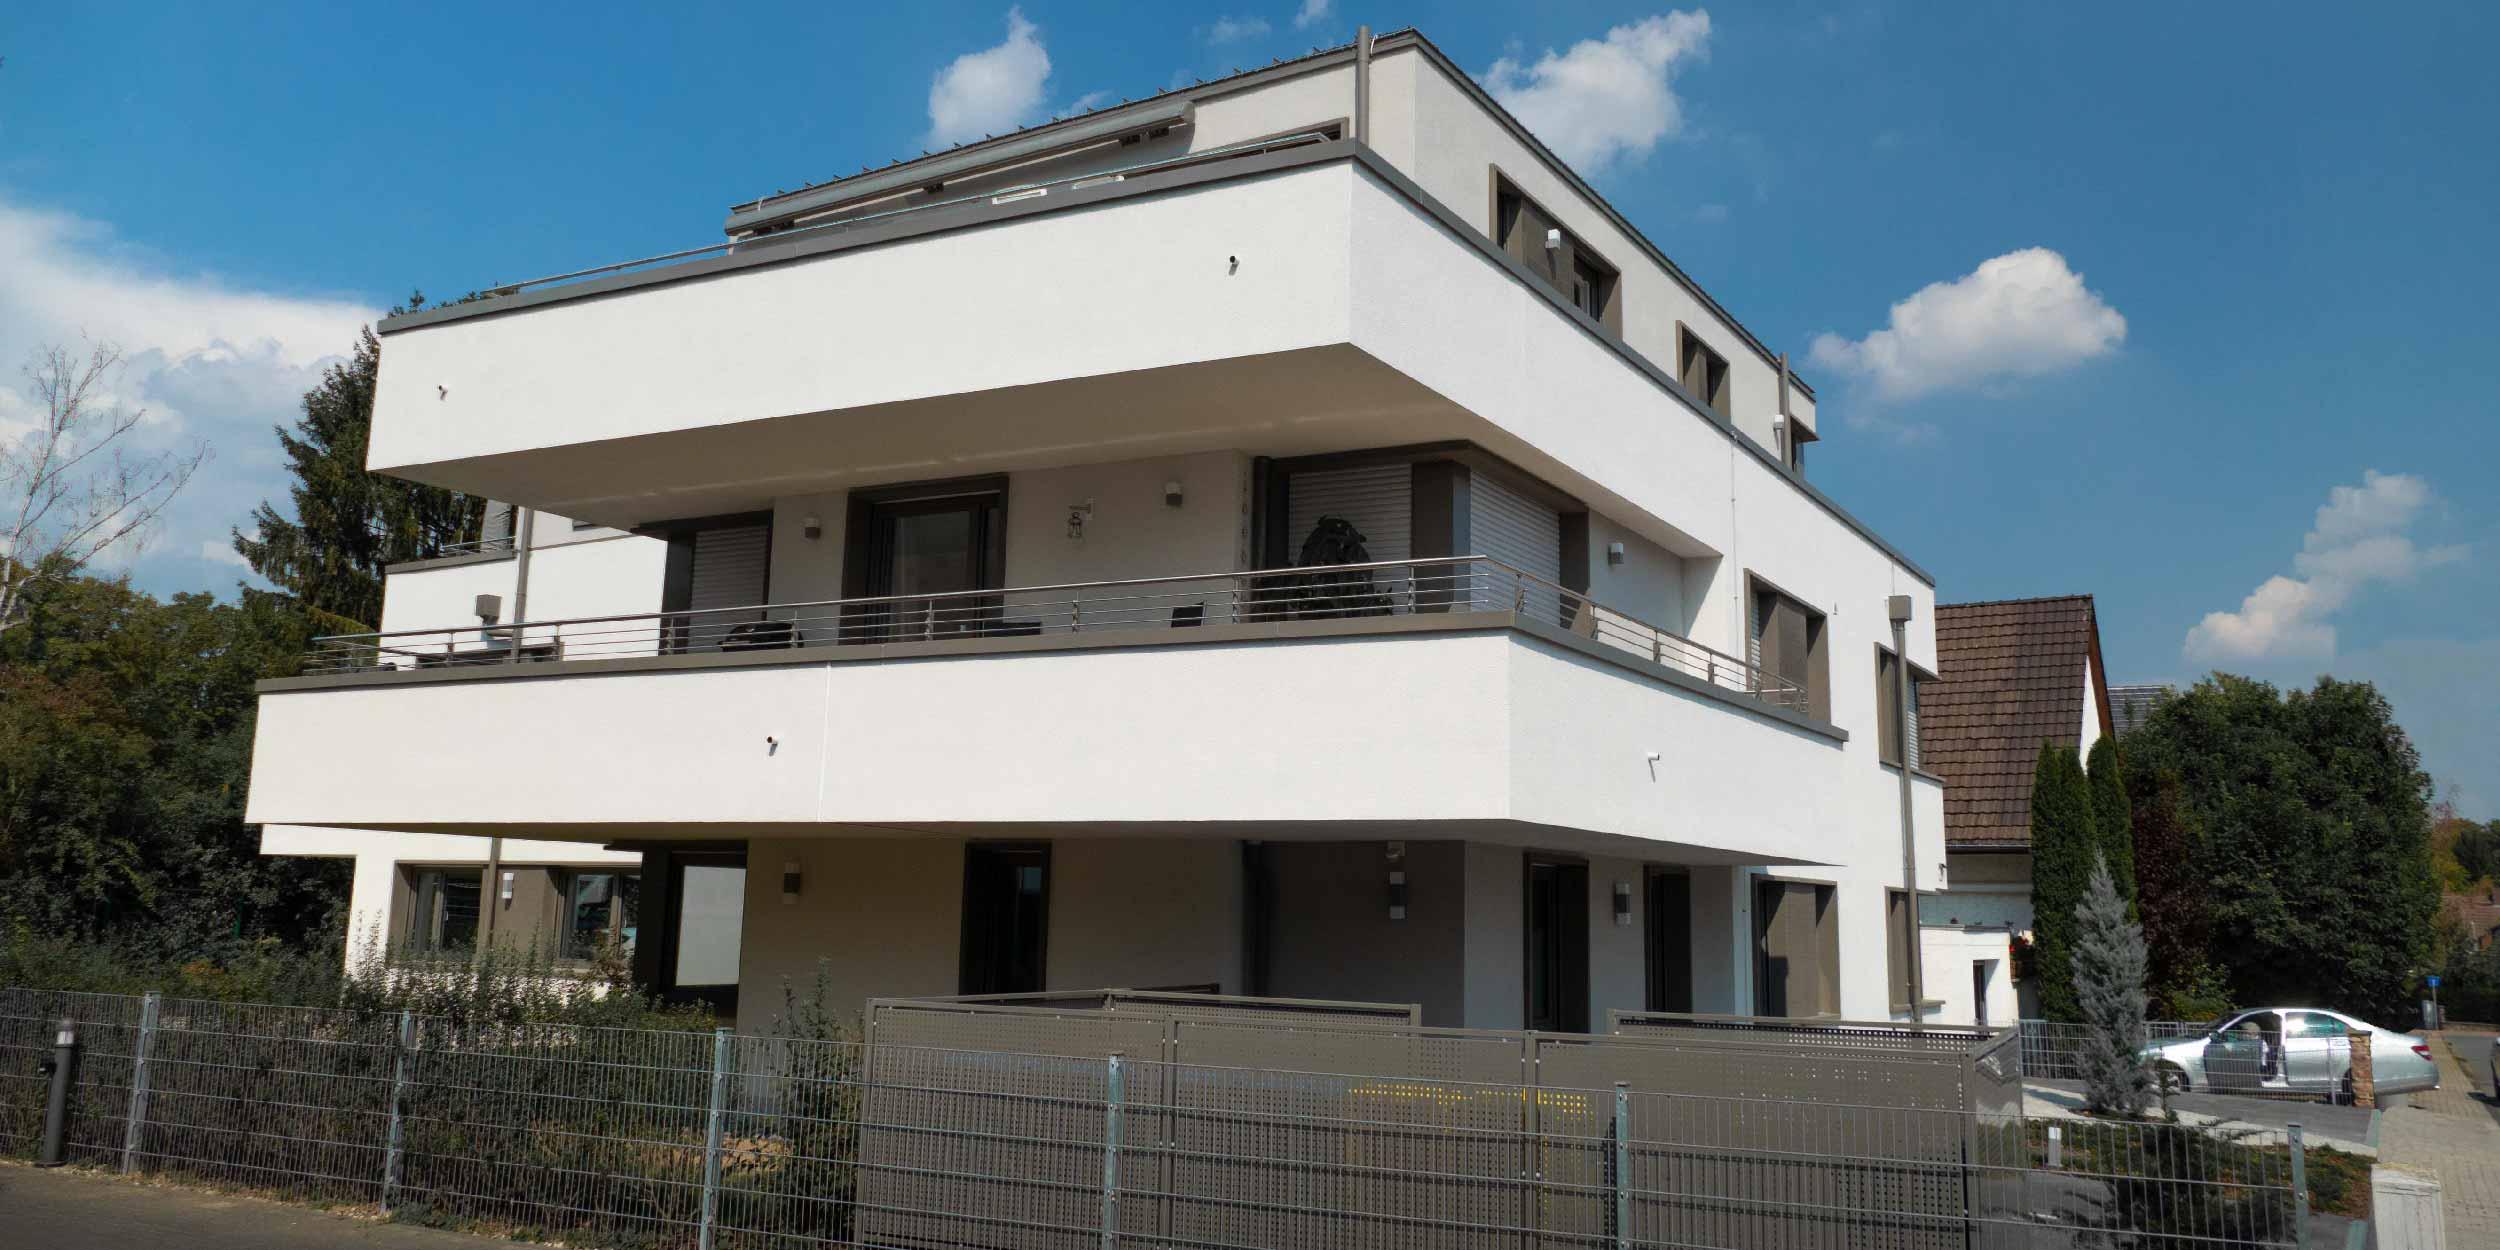 bauunternehmen_wingenfeld_gmbh_fulda_bauen_eschborn_mehrfamilienwohnhaus_rhein_main